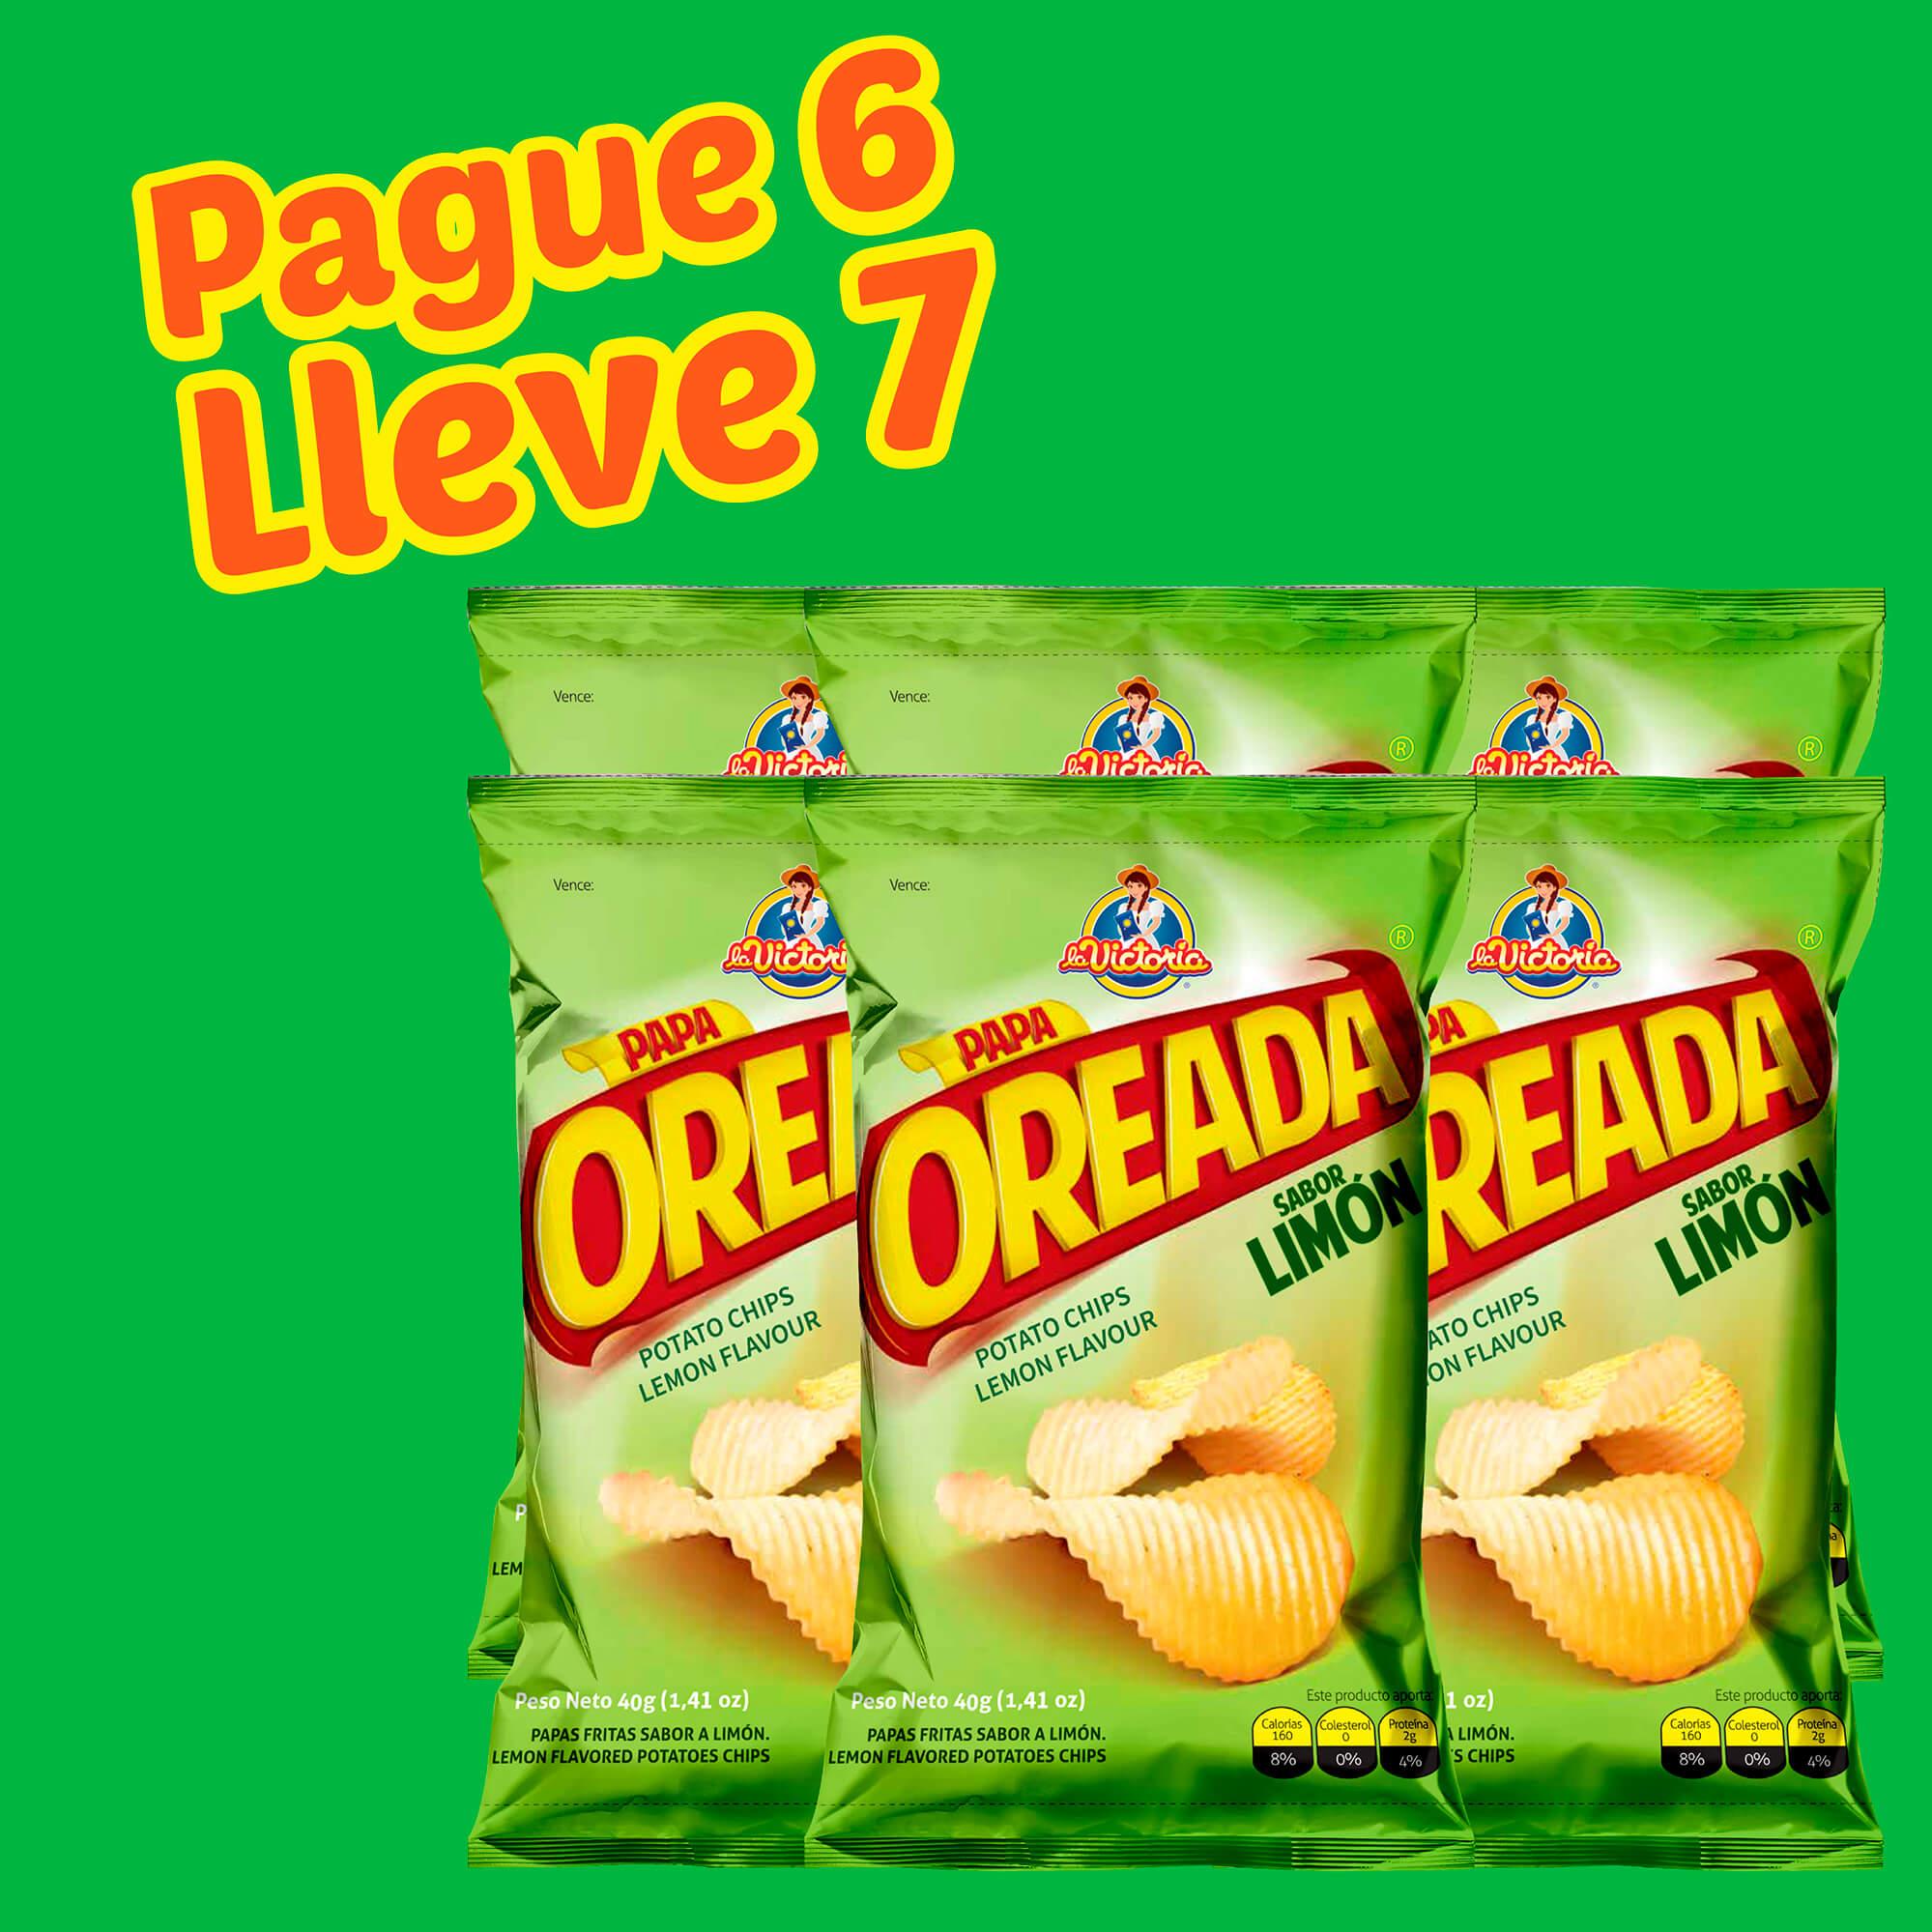 Papa Oreada Limón 40 g (Display PAGUE 6 LLEVE 7 UND.)_2